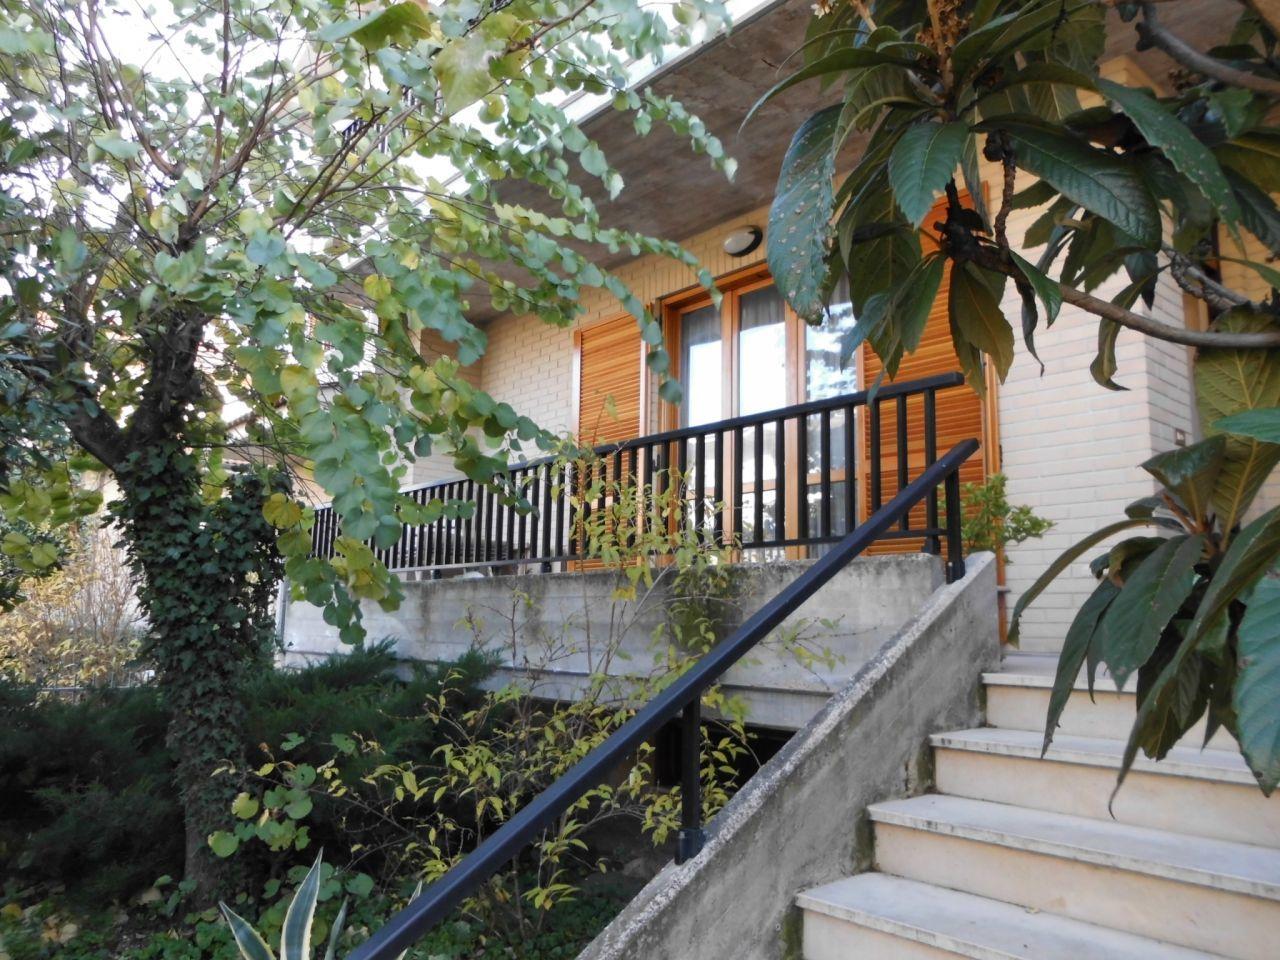 Soluzione Indipendente in vendita a Maiolati Spontini, 6 locali, Trattative riservate | Cambio Casa.it